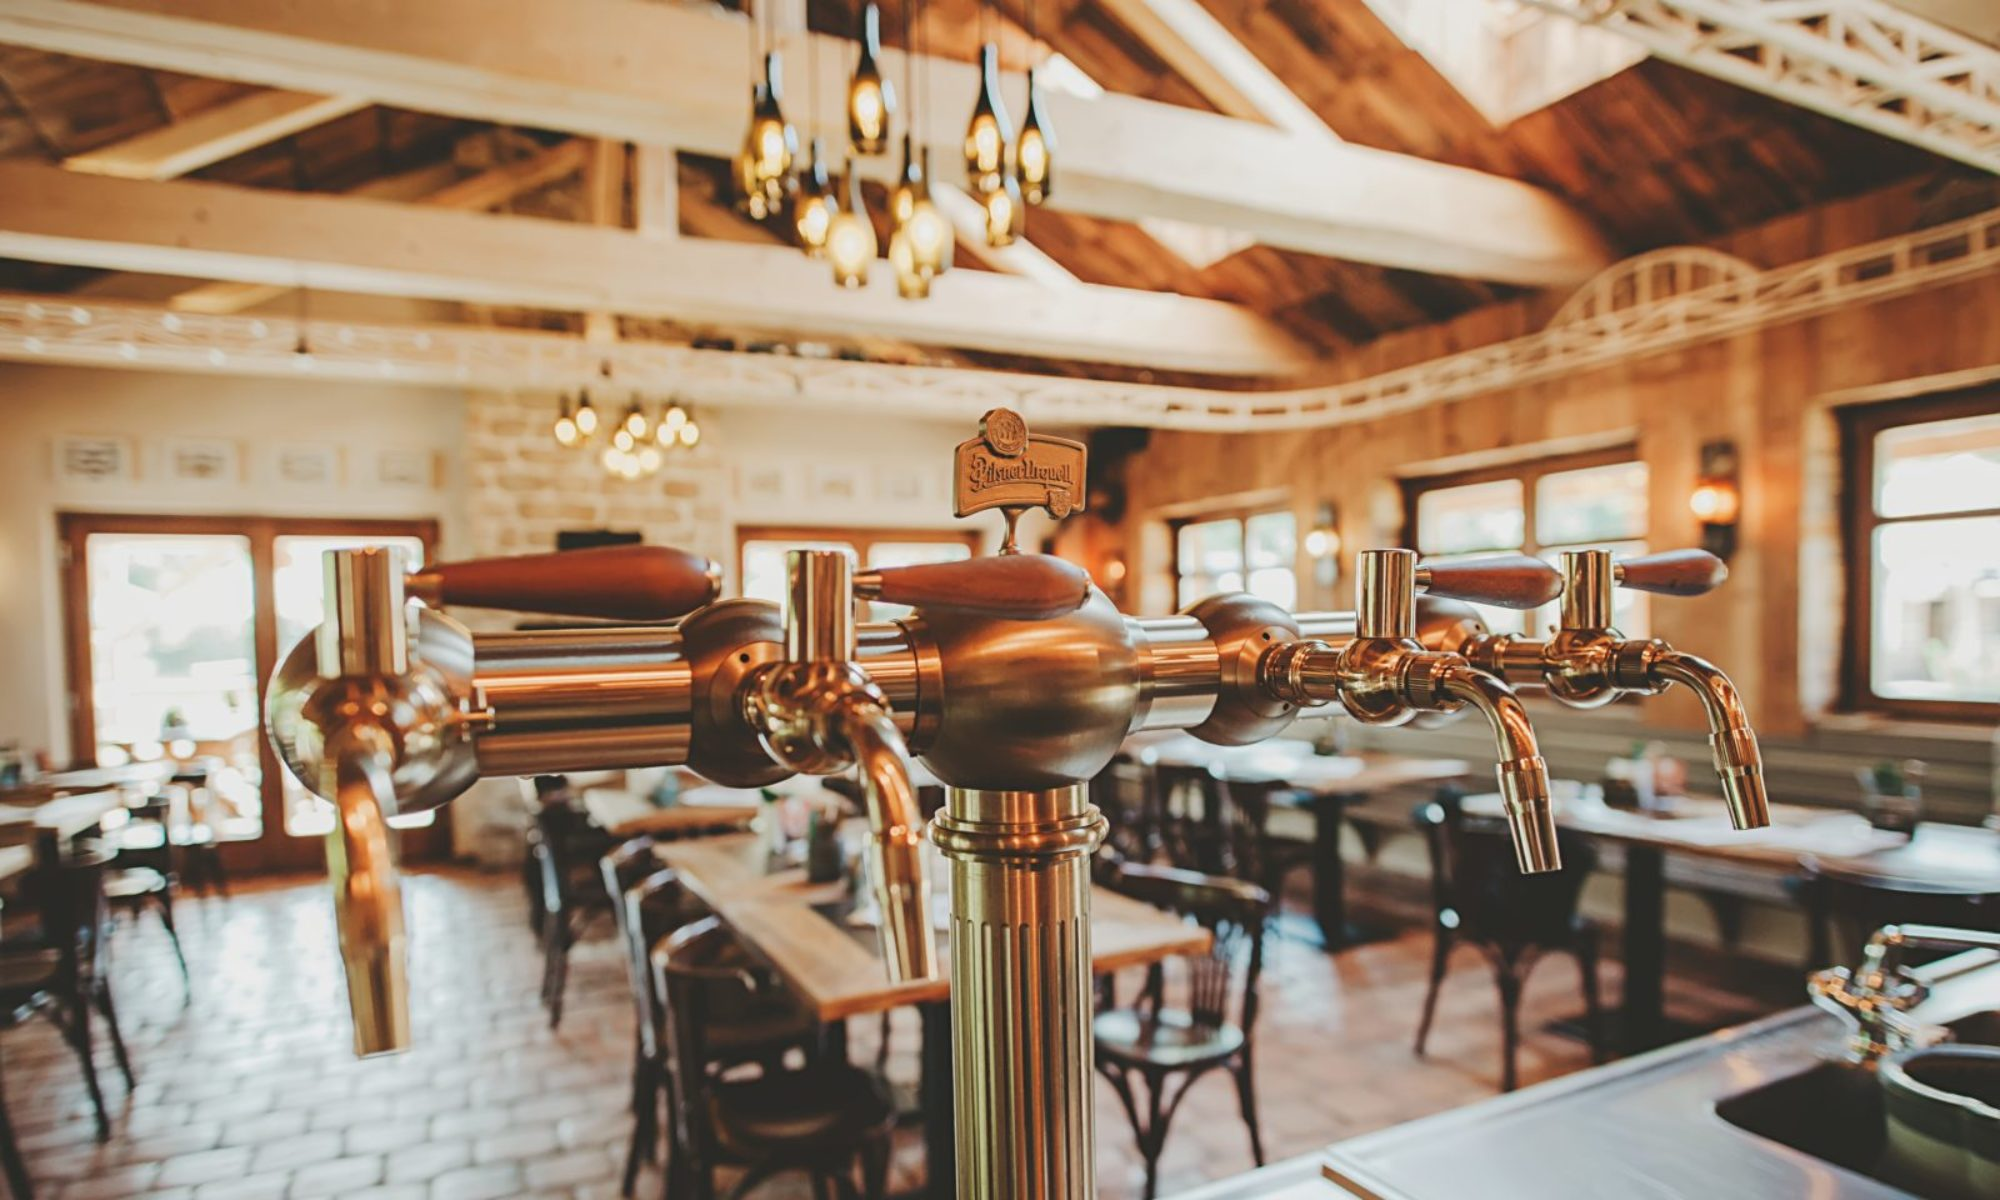 Krmelec Vlaška - brdská restaurace